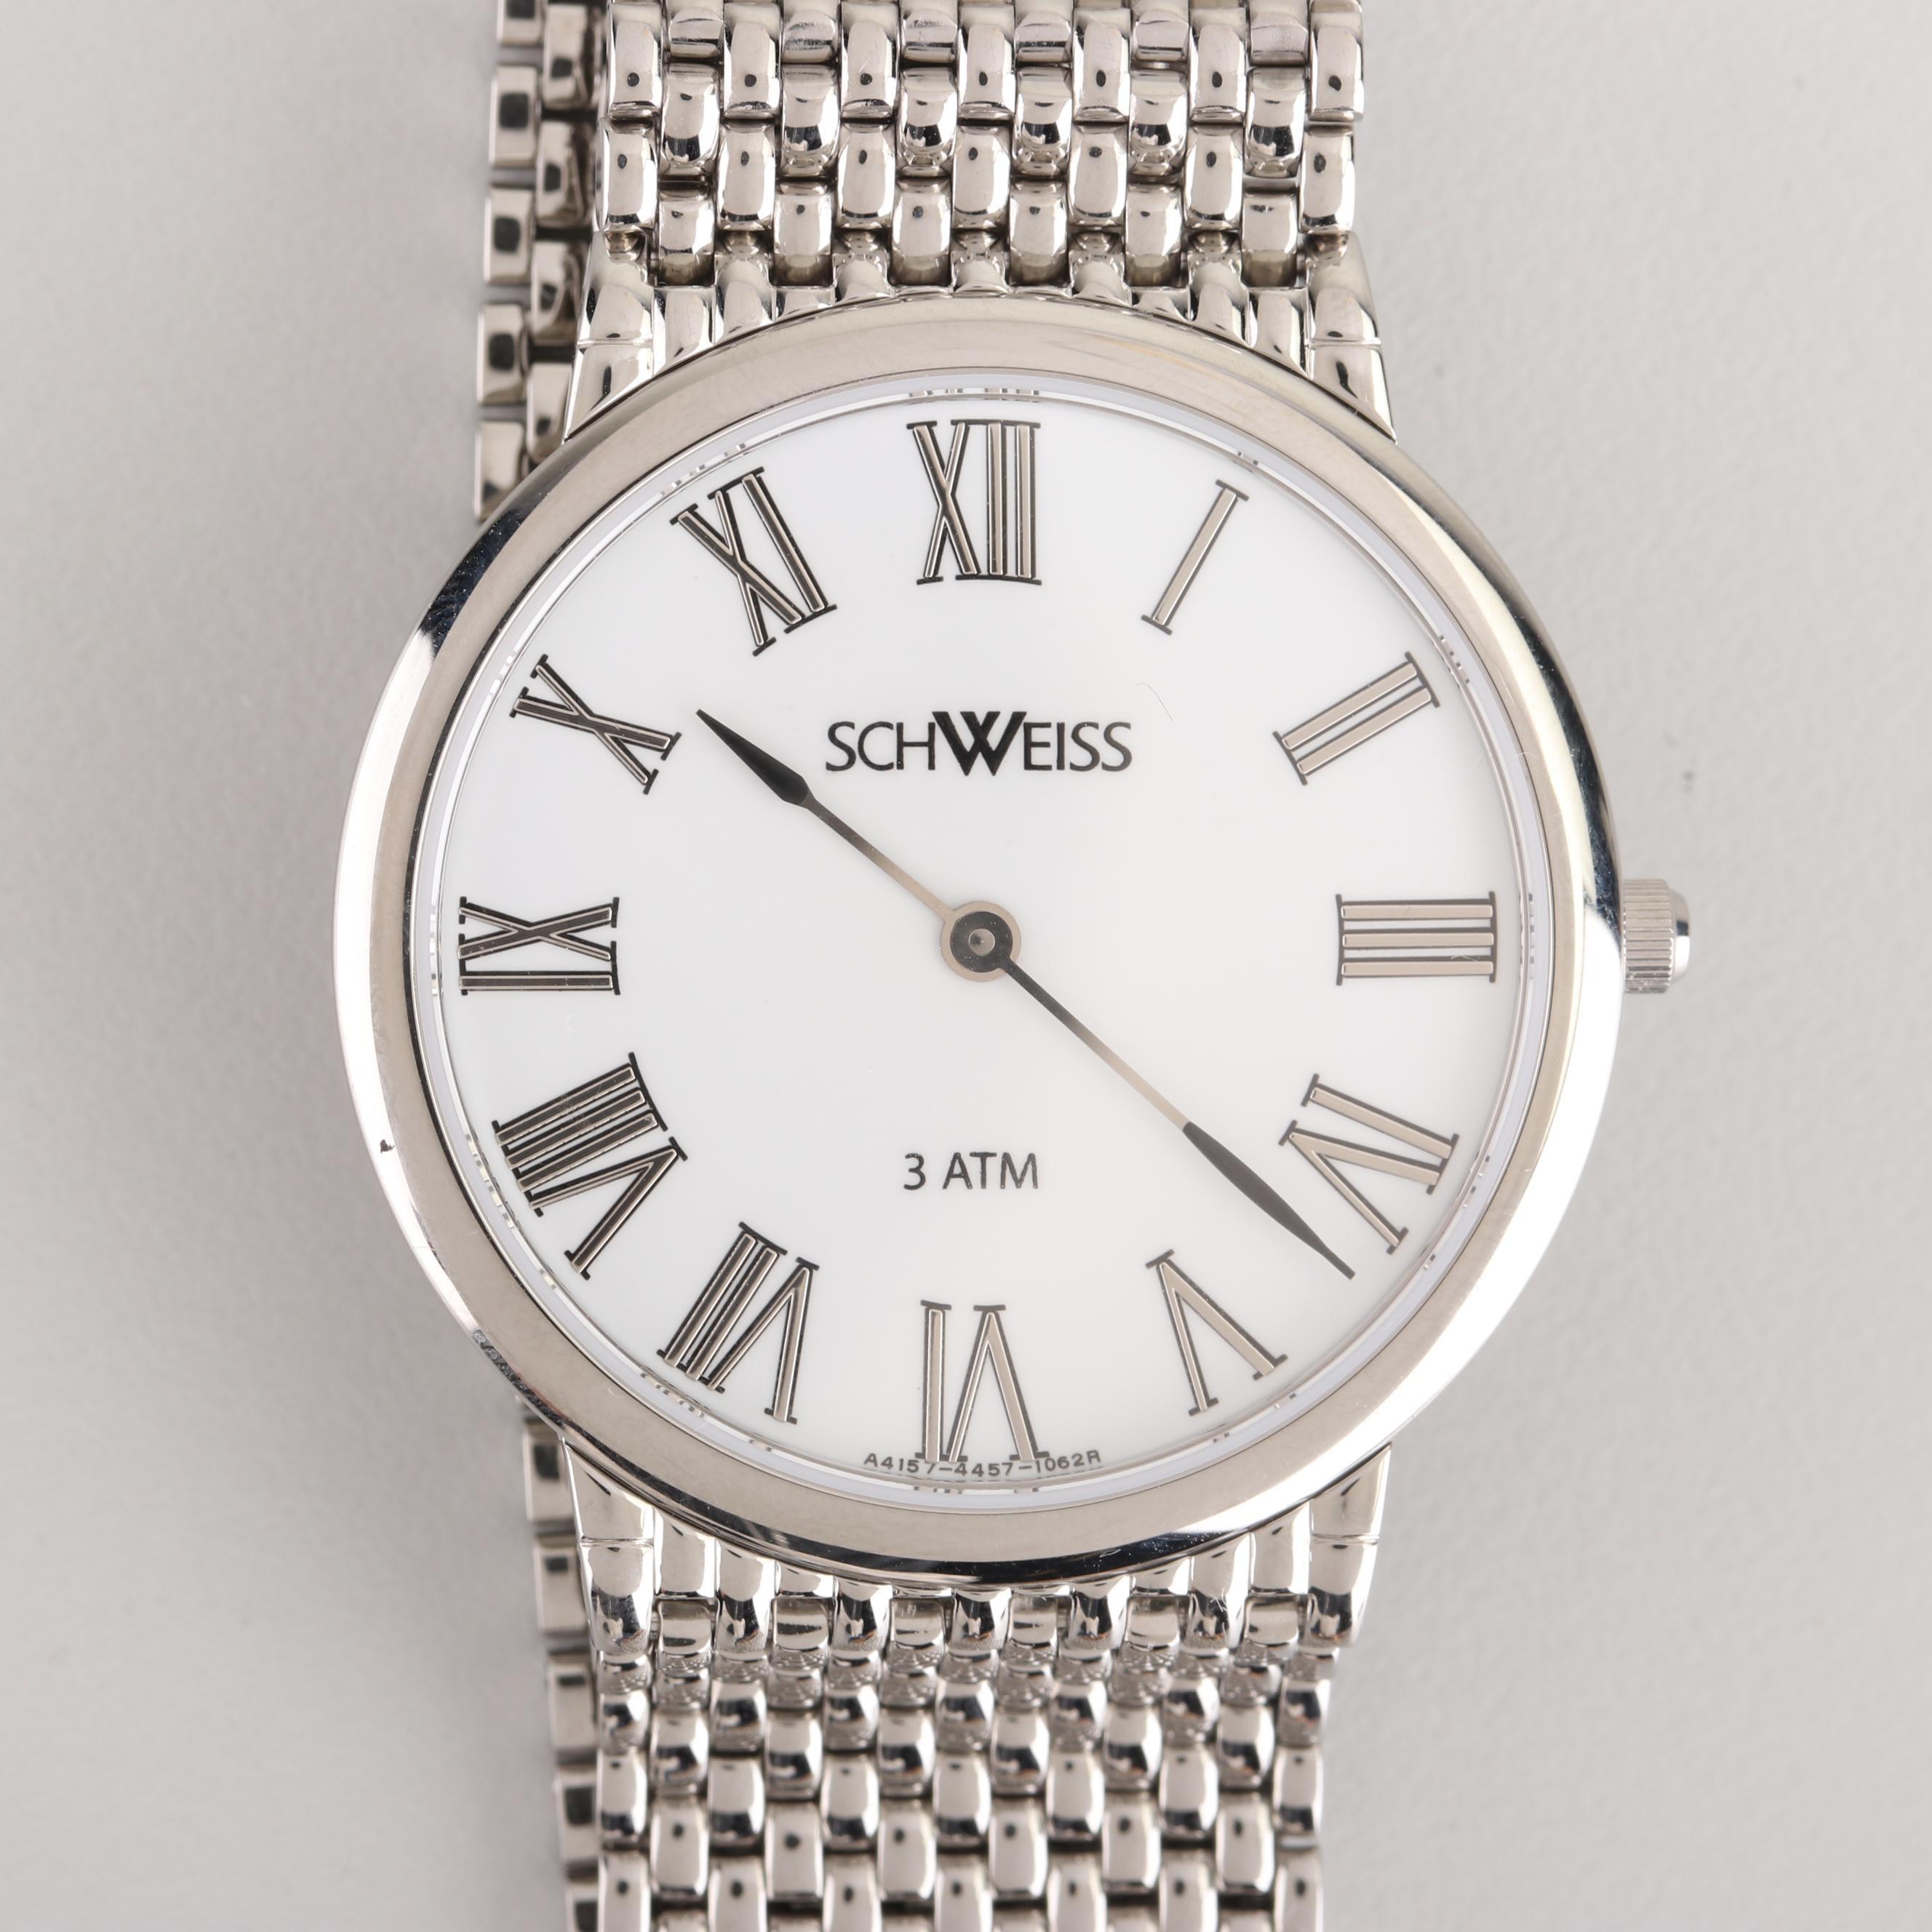 Schweiss Swiss Stainless Steel Wristwatch